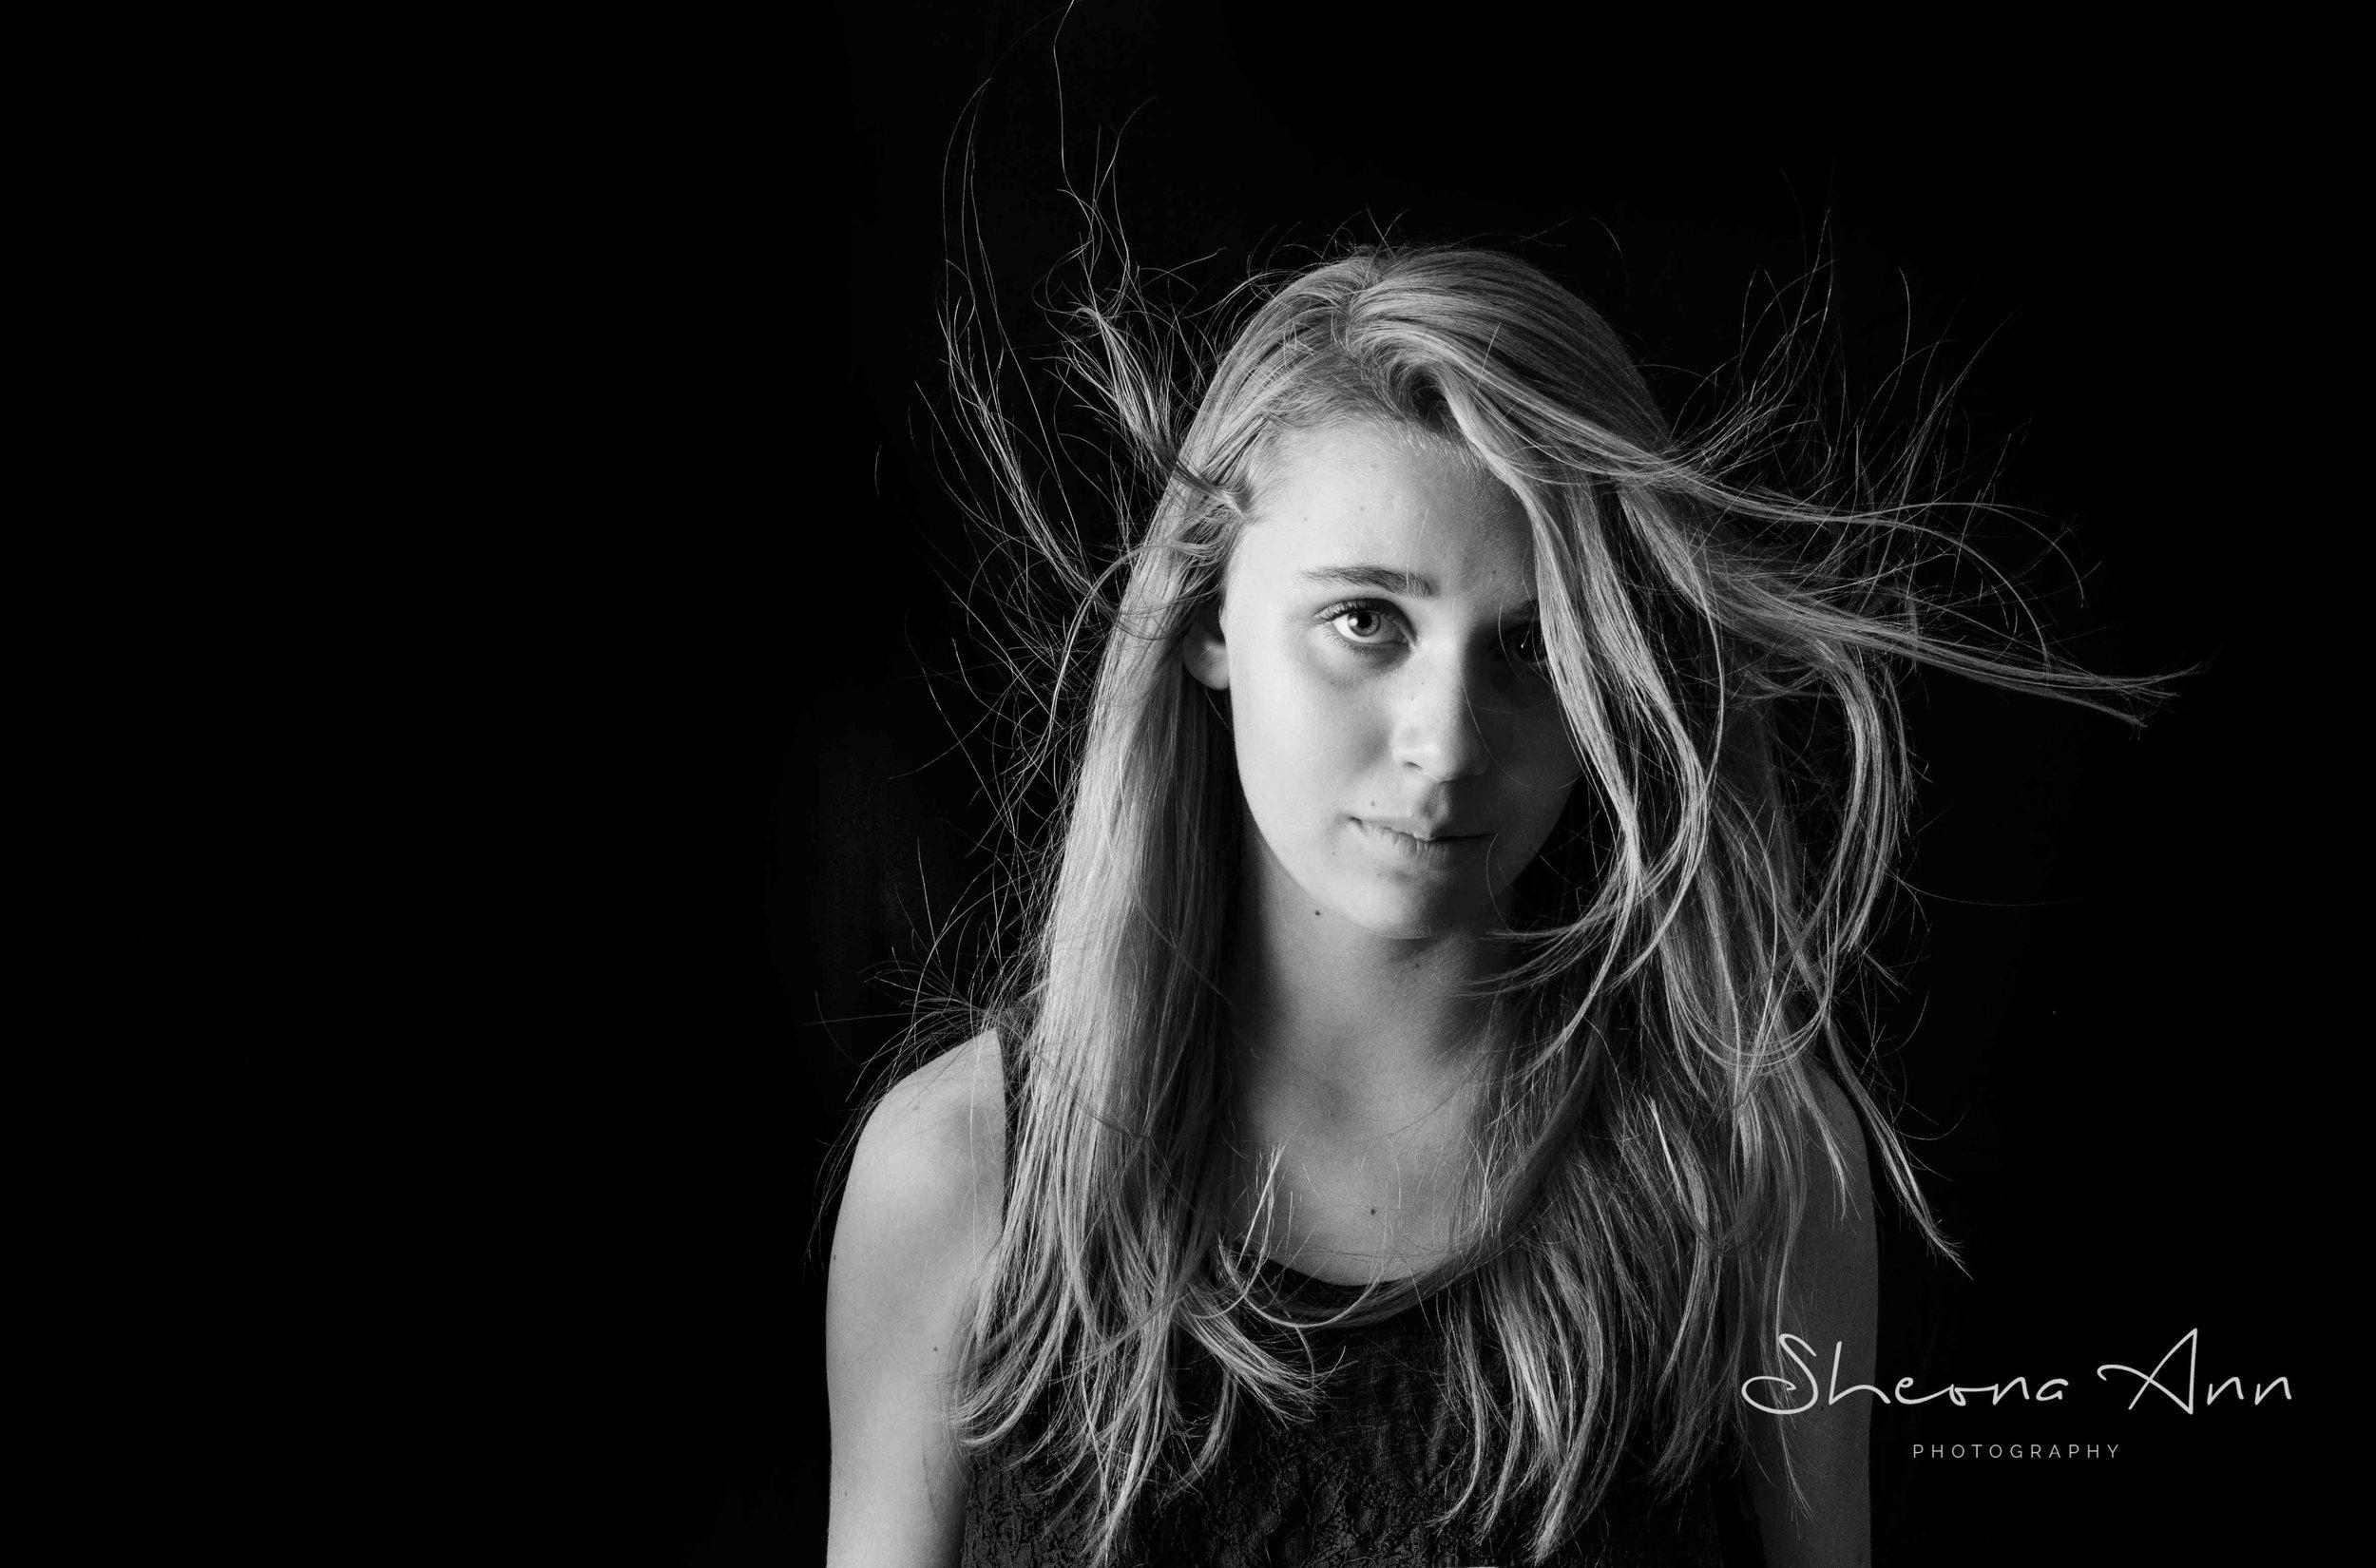 pretty-girl-wind-in-hair-B&W-portrait-Sheona-Ann-Photography.jpg